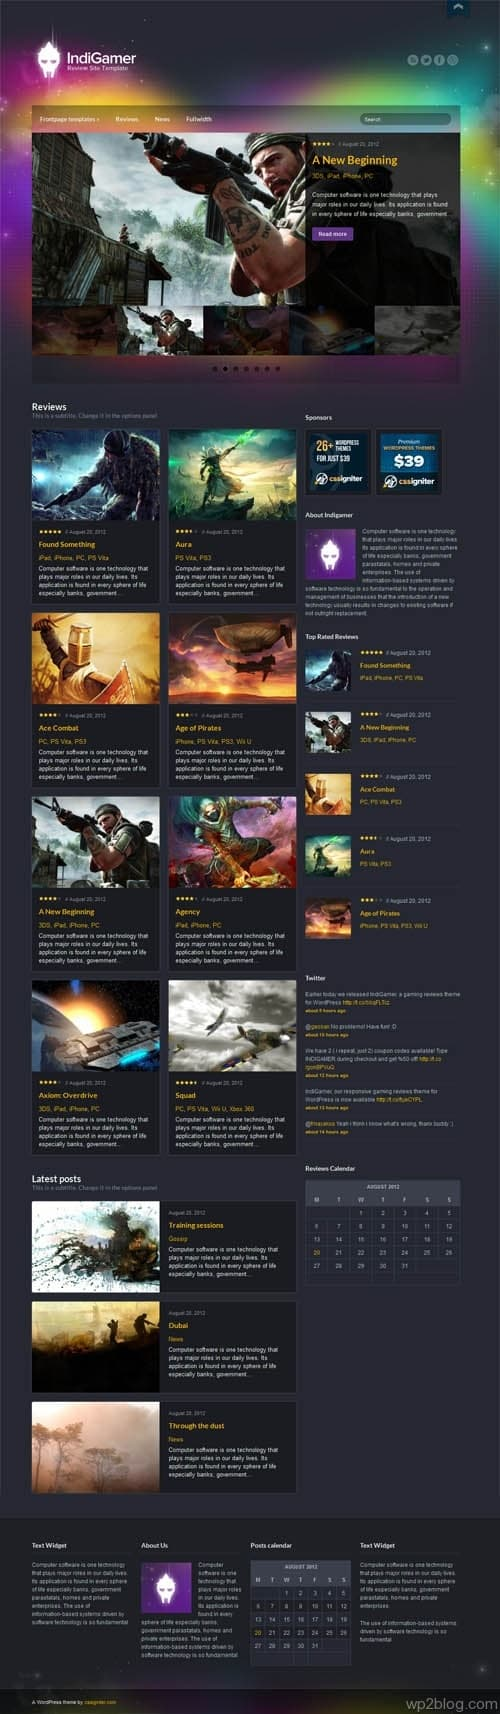 indi-gamer wordpress theme